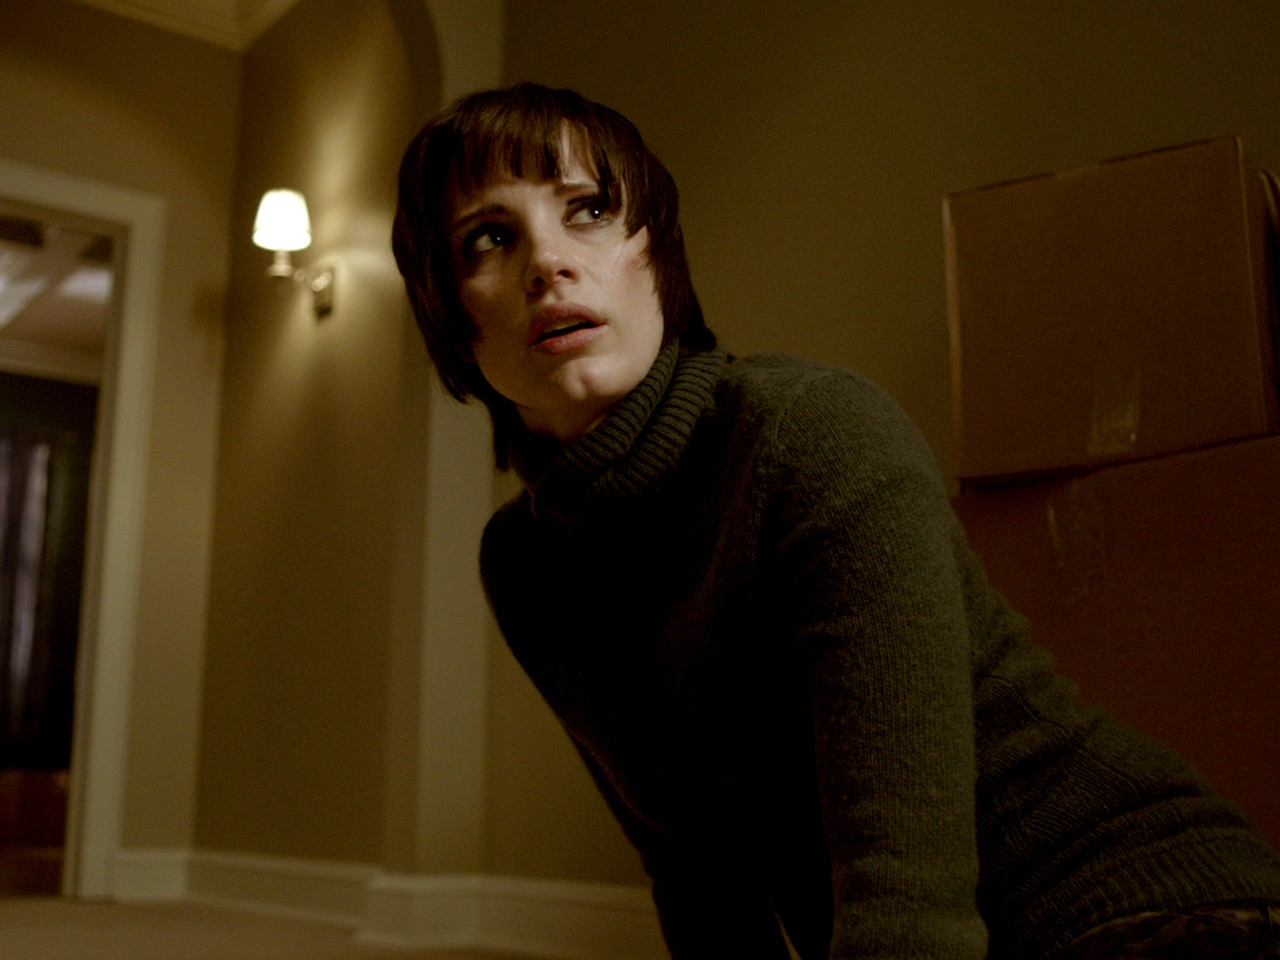 Soresport Movies: Mama (2013) - Horror Ghost